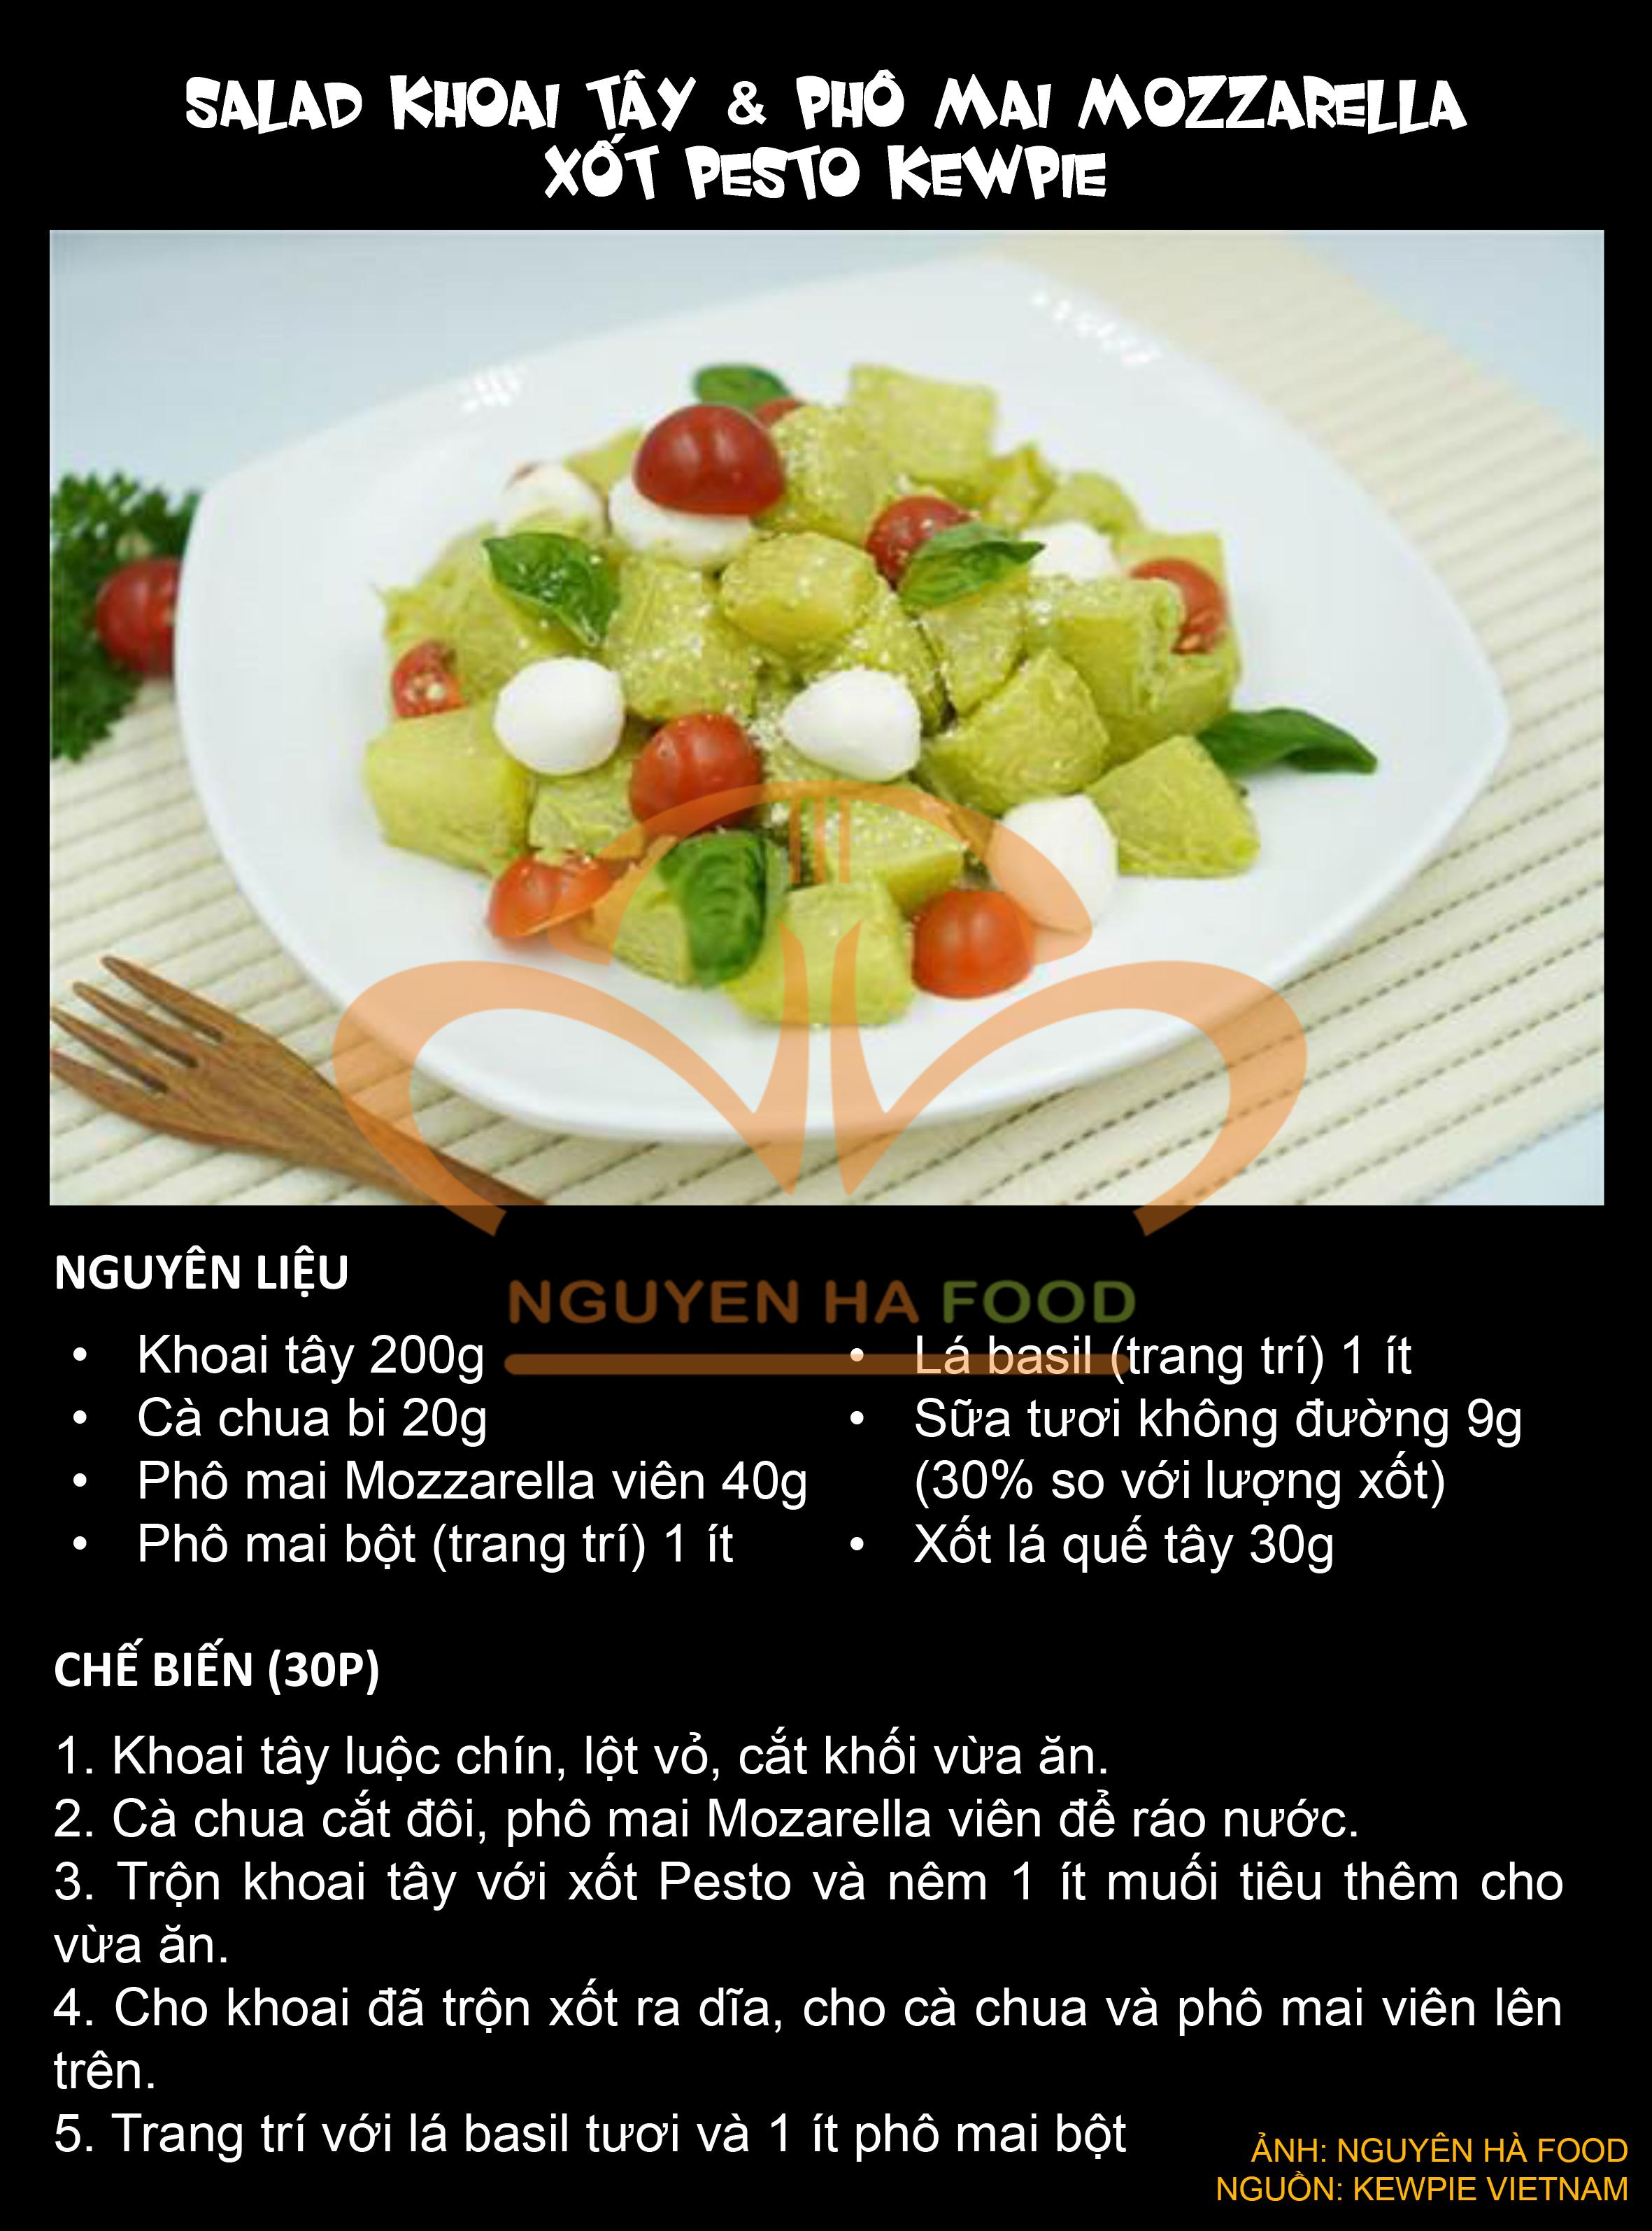 8 SALAD KHOAI TAY VA PHO MAI MOZZARELLA XOT PESTO KEWPIE - NGUYEN HA FOOD